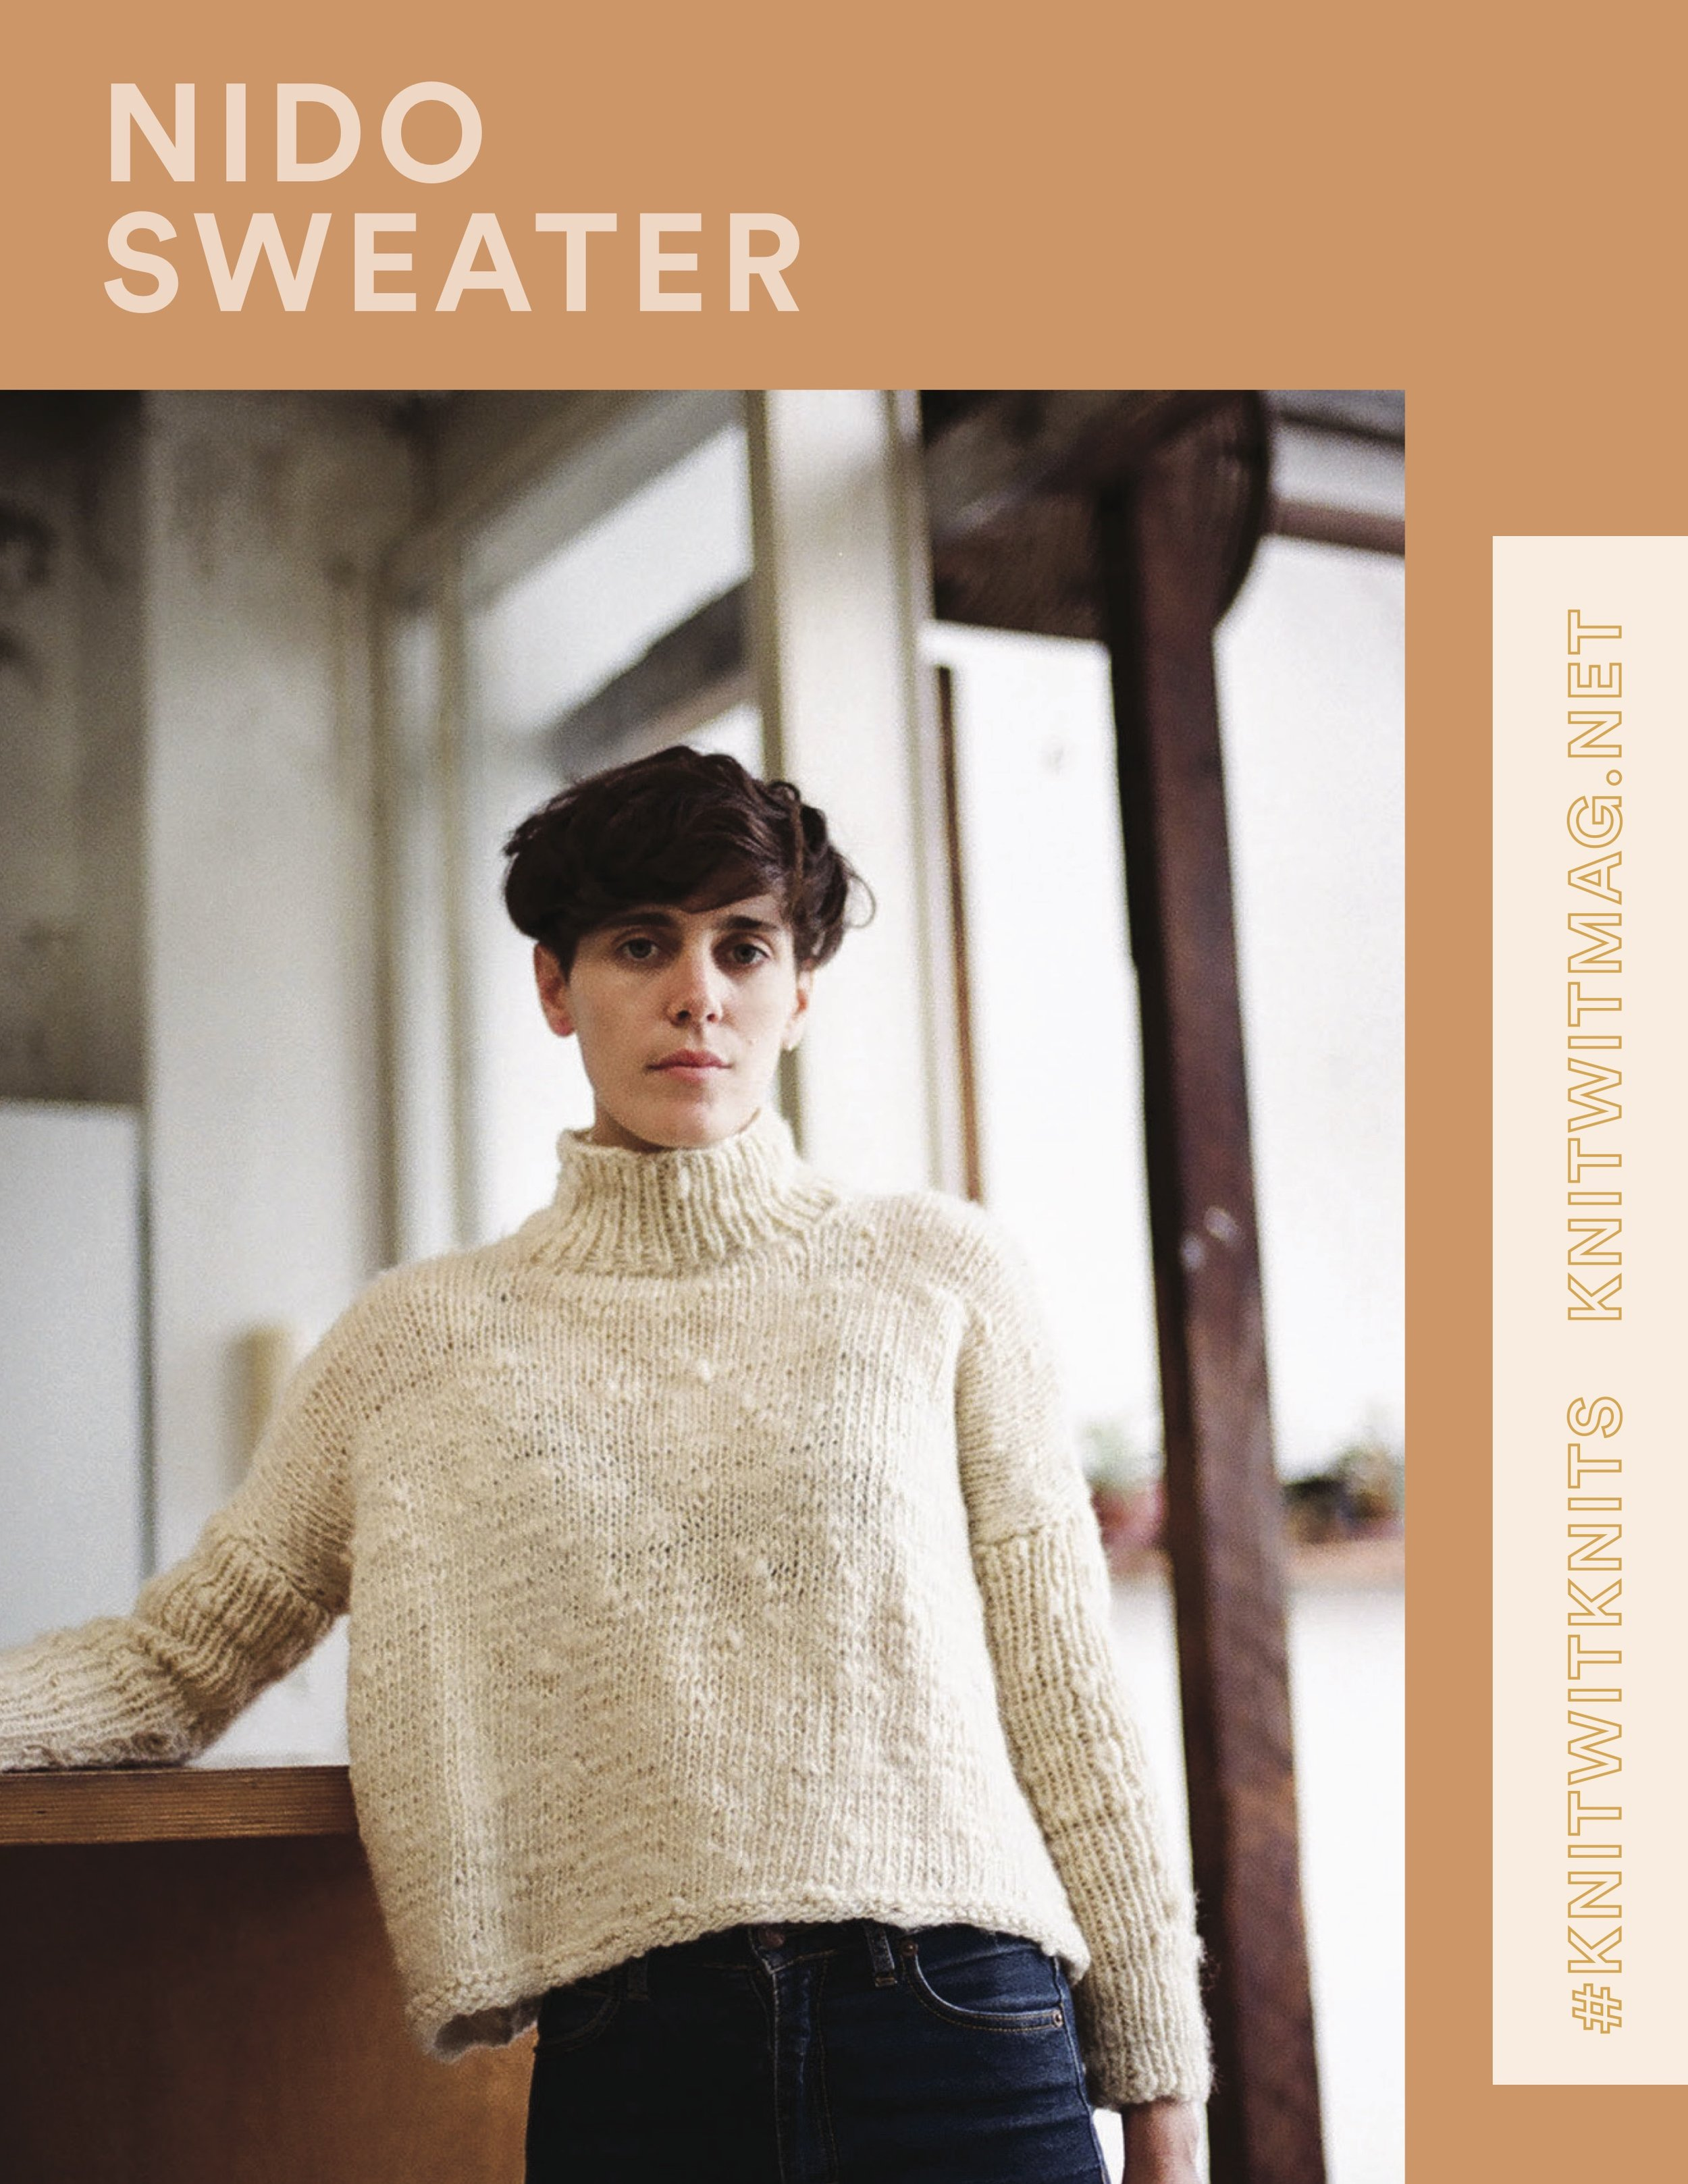 Knit Wit_Nido Sweater.jpg